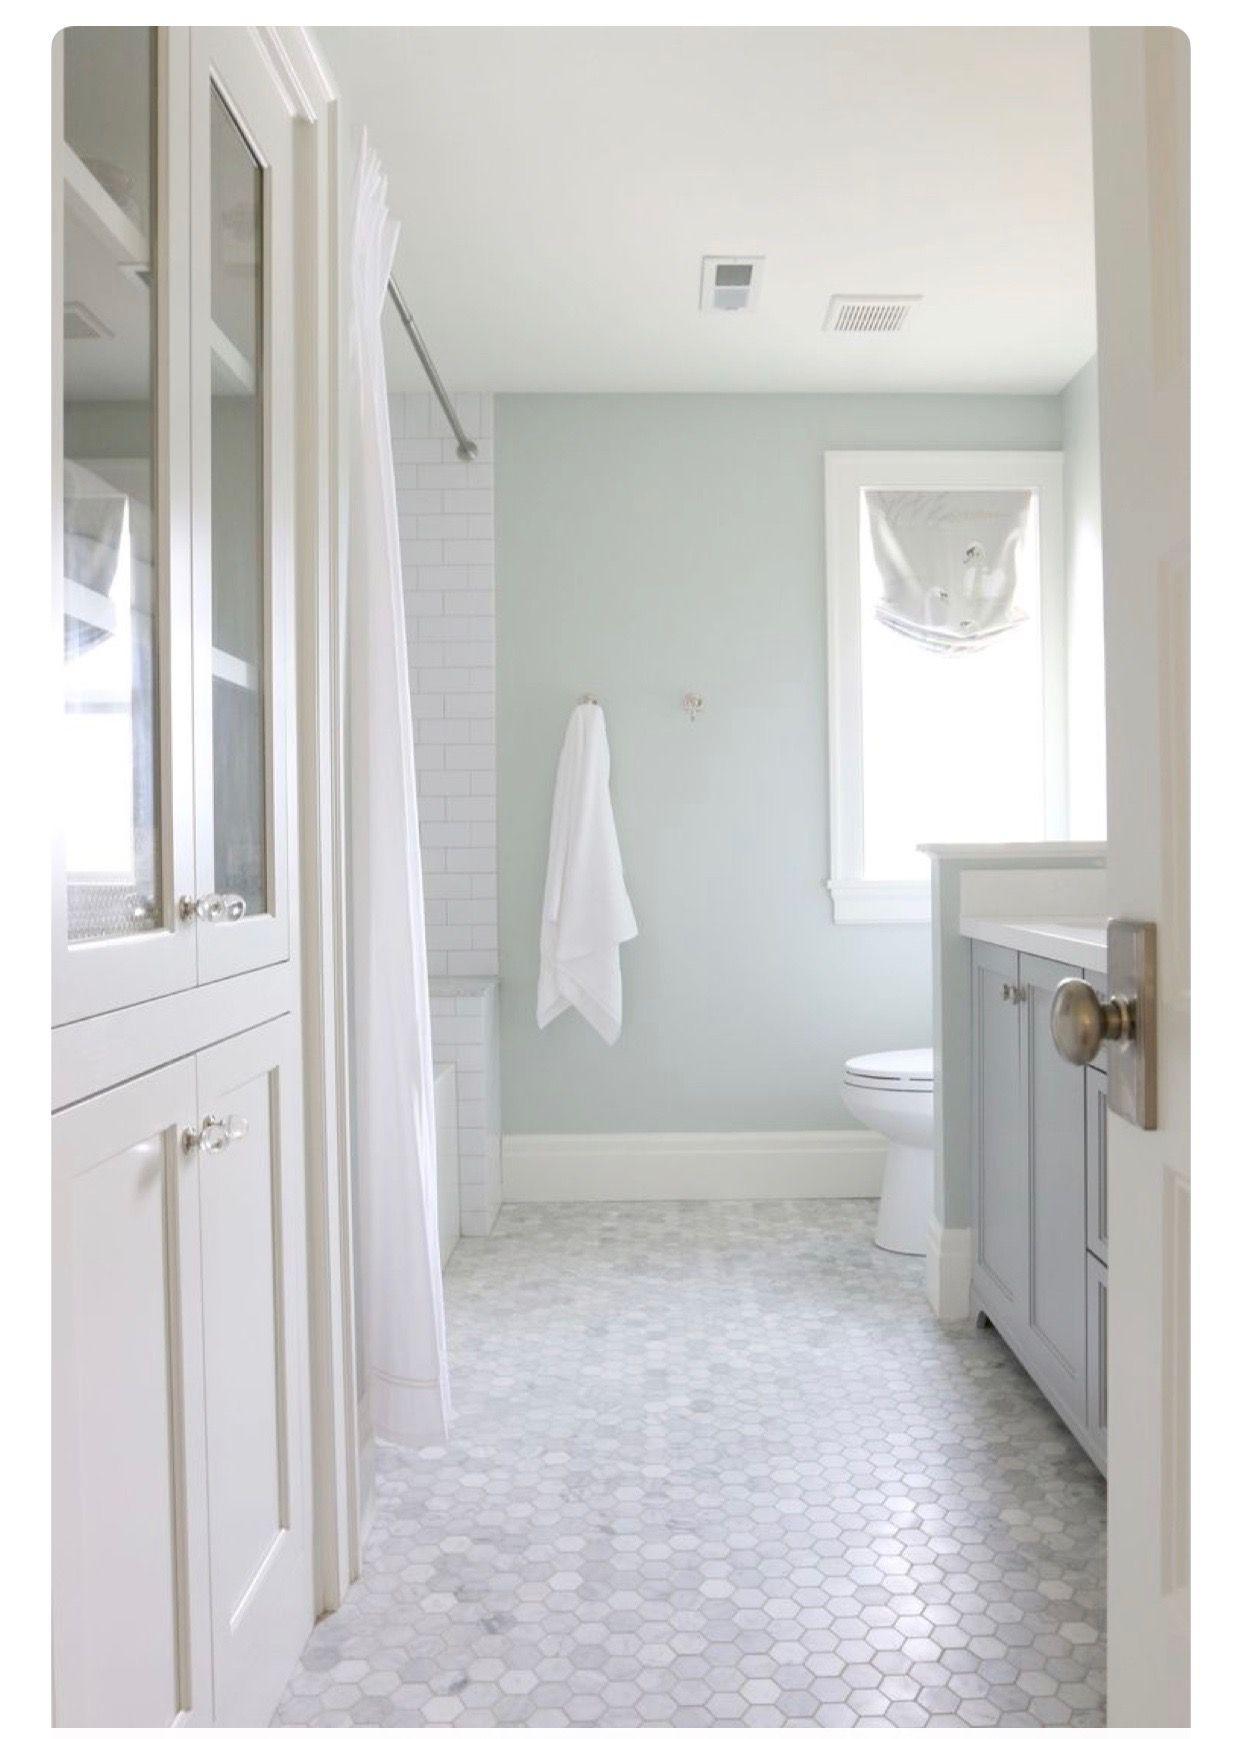 Average Height Of Tile In Bathroom